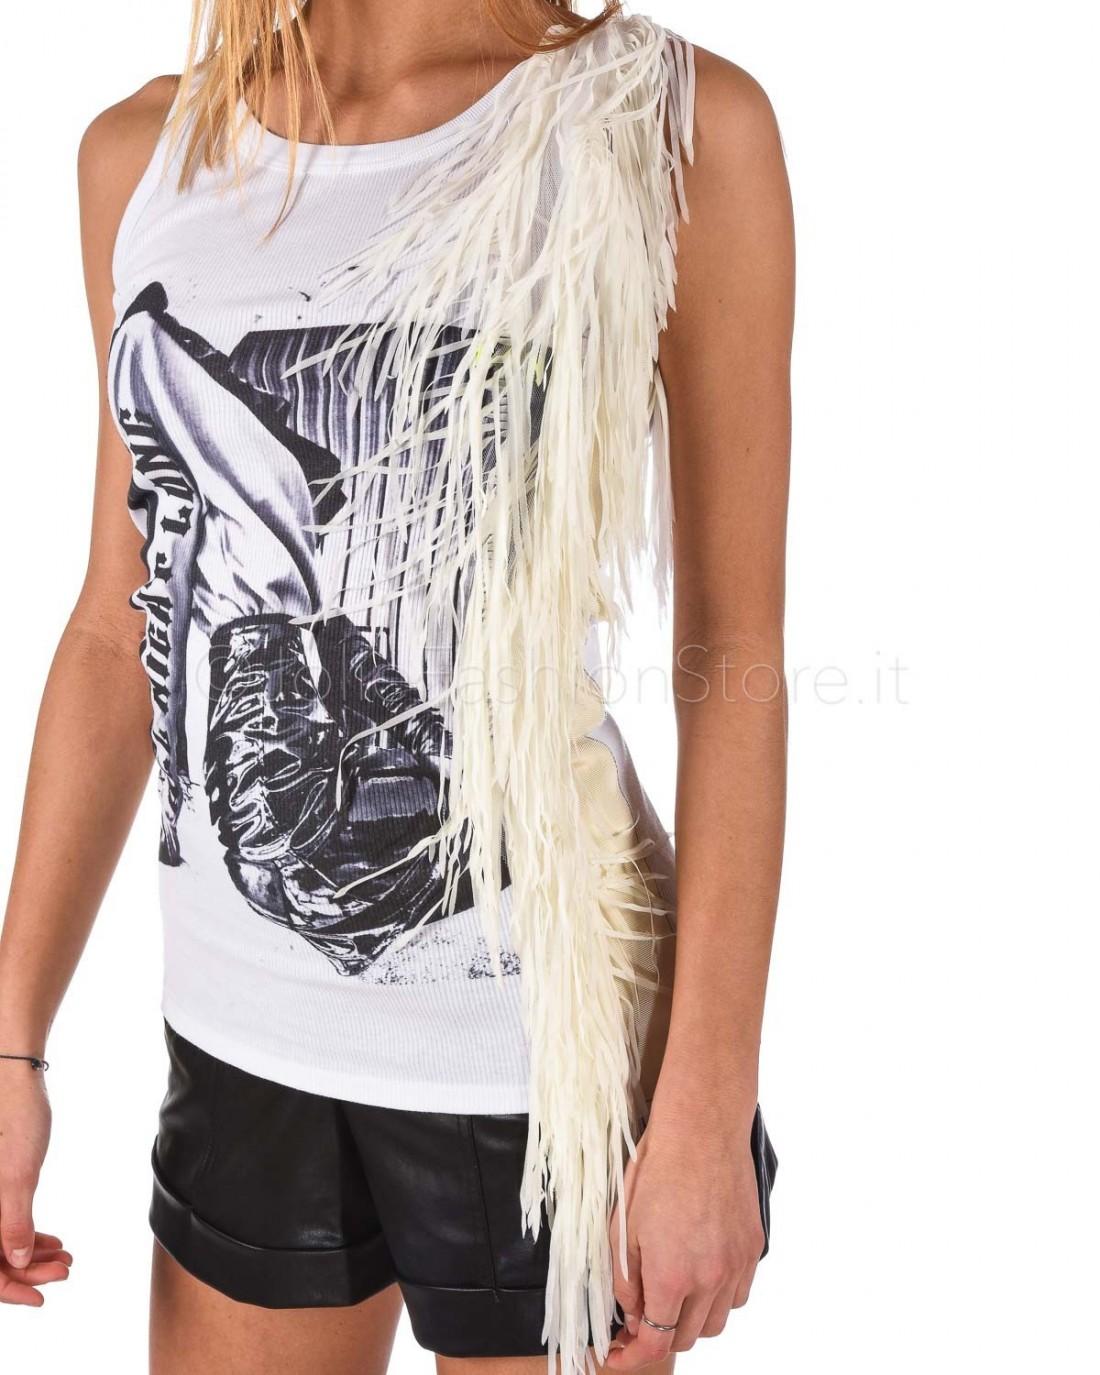 Gina Gorgeous Top con Frange  GI190715/A